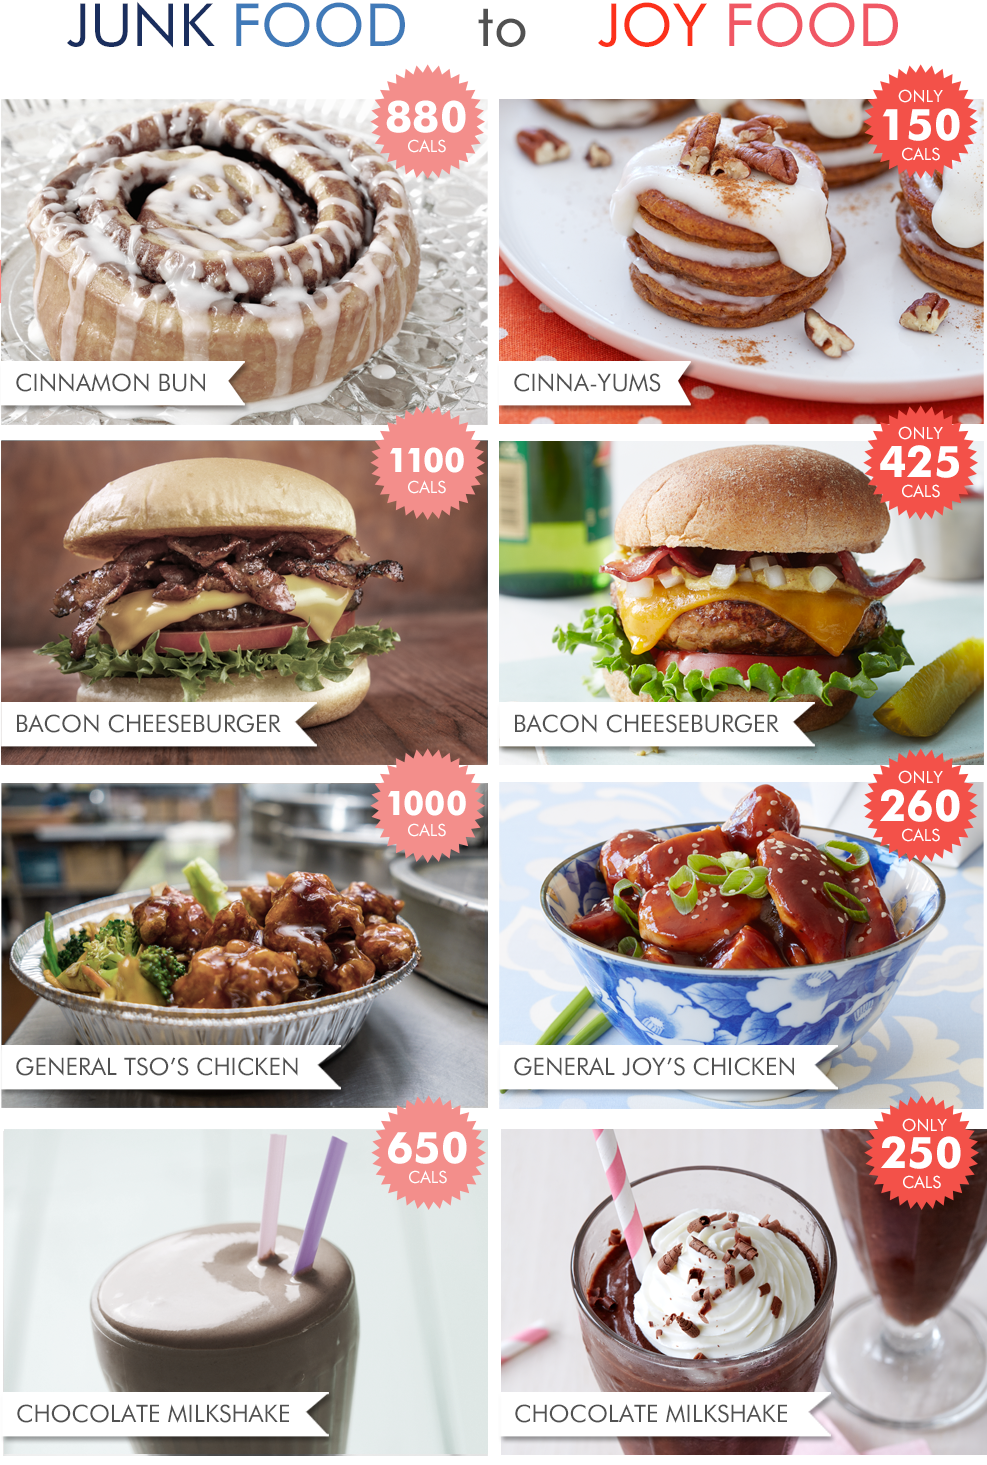 junk-food-to-joy-food